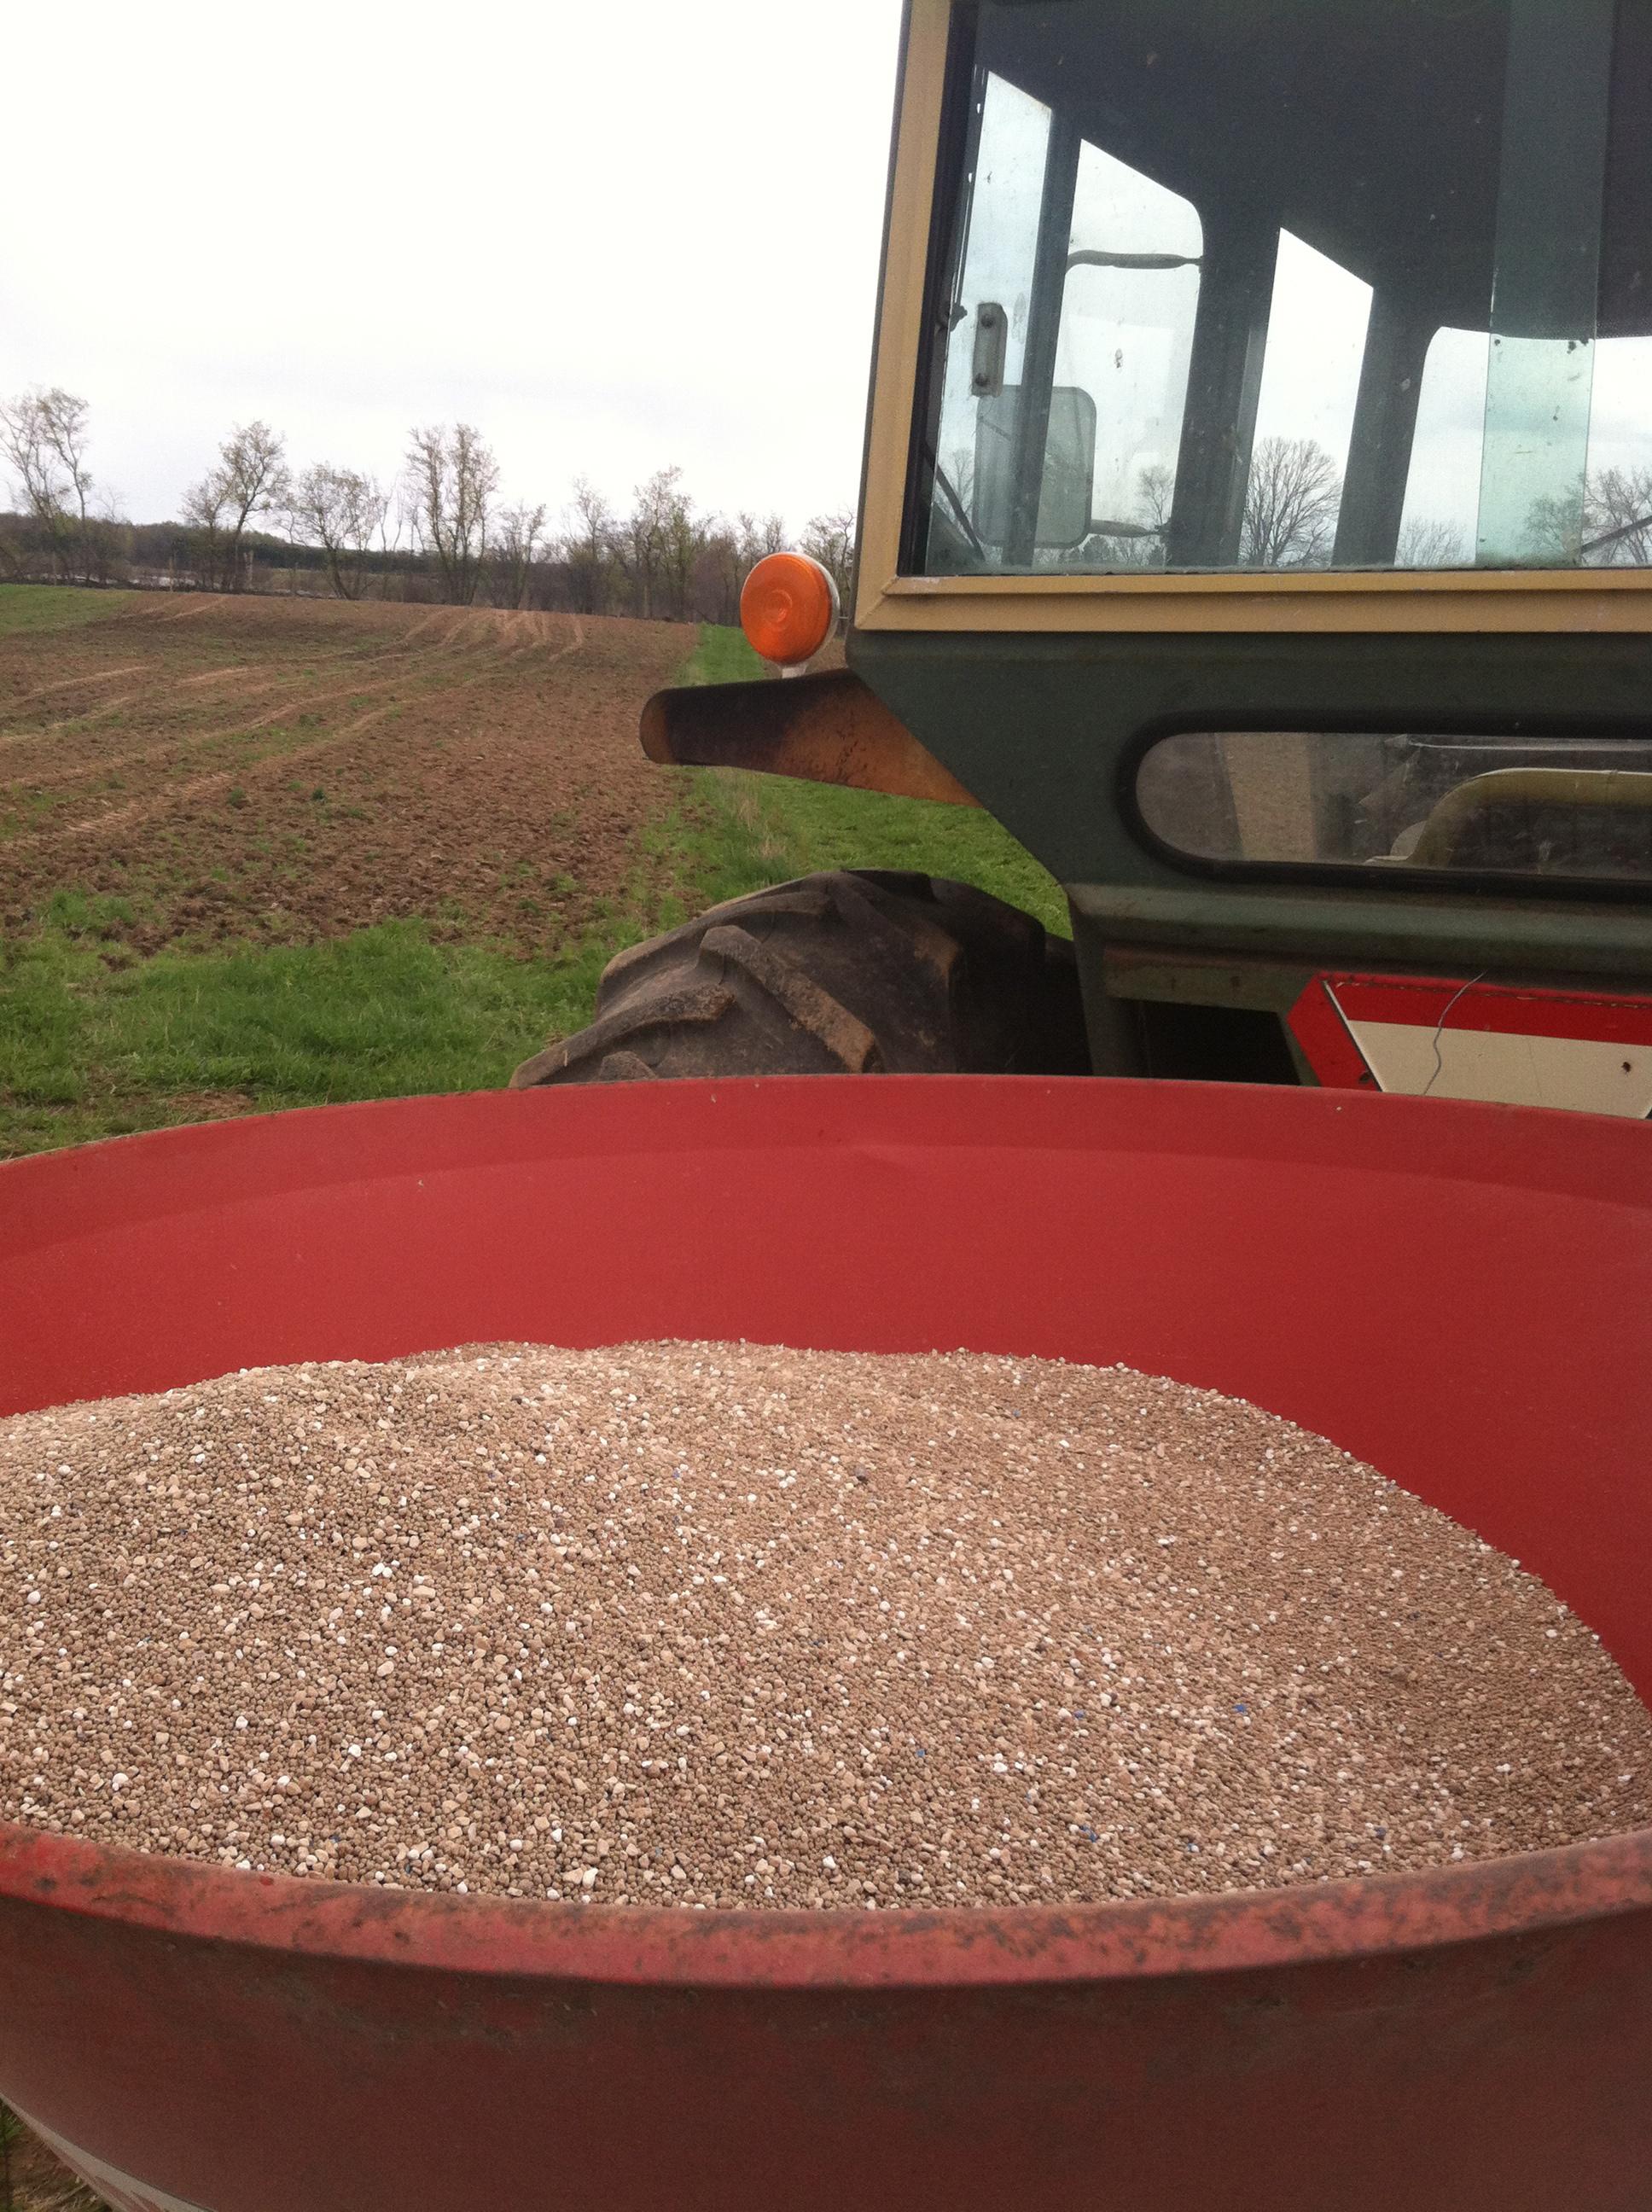 so we got to work spreading soil amendments